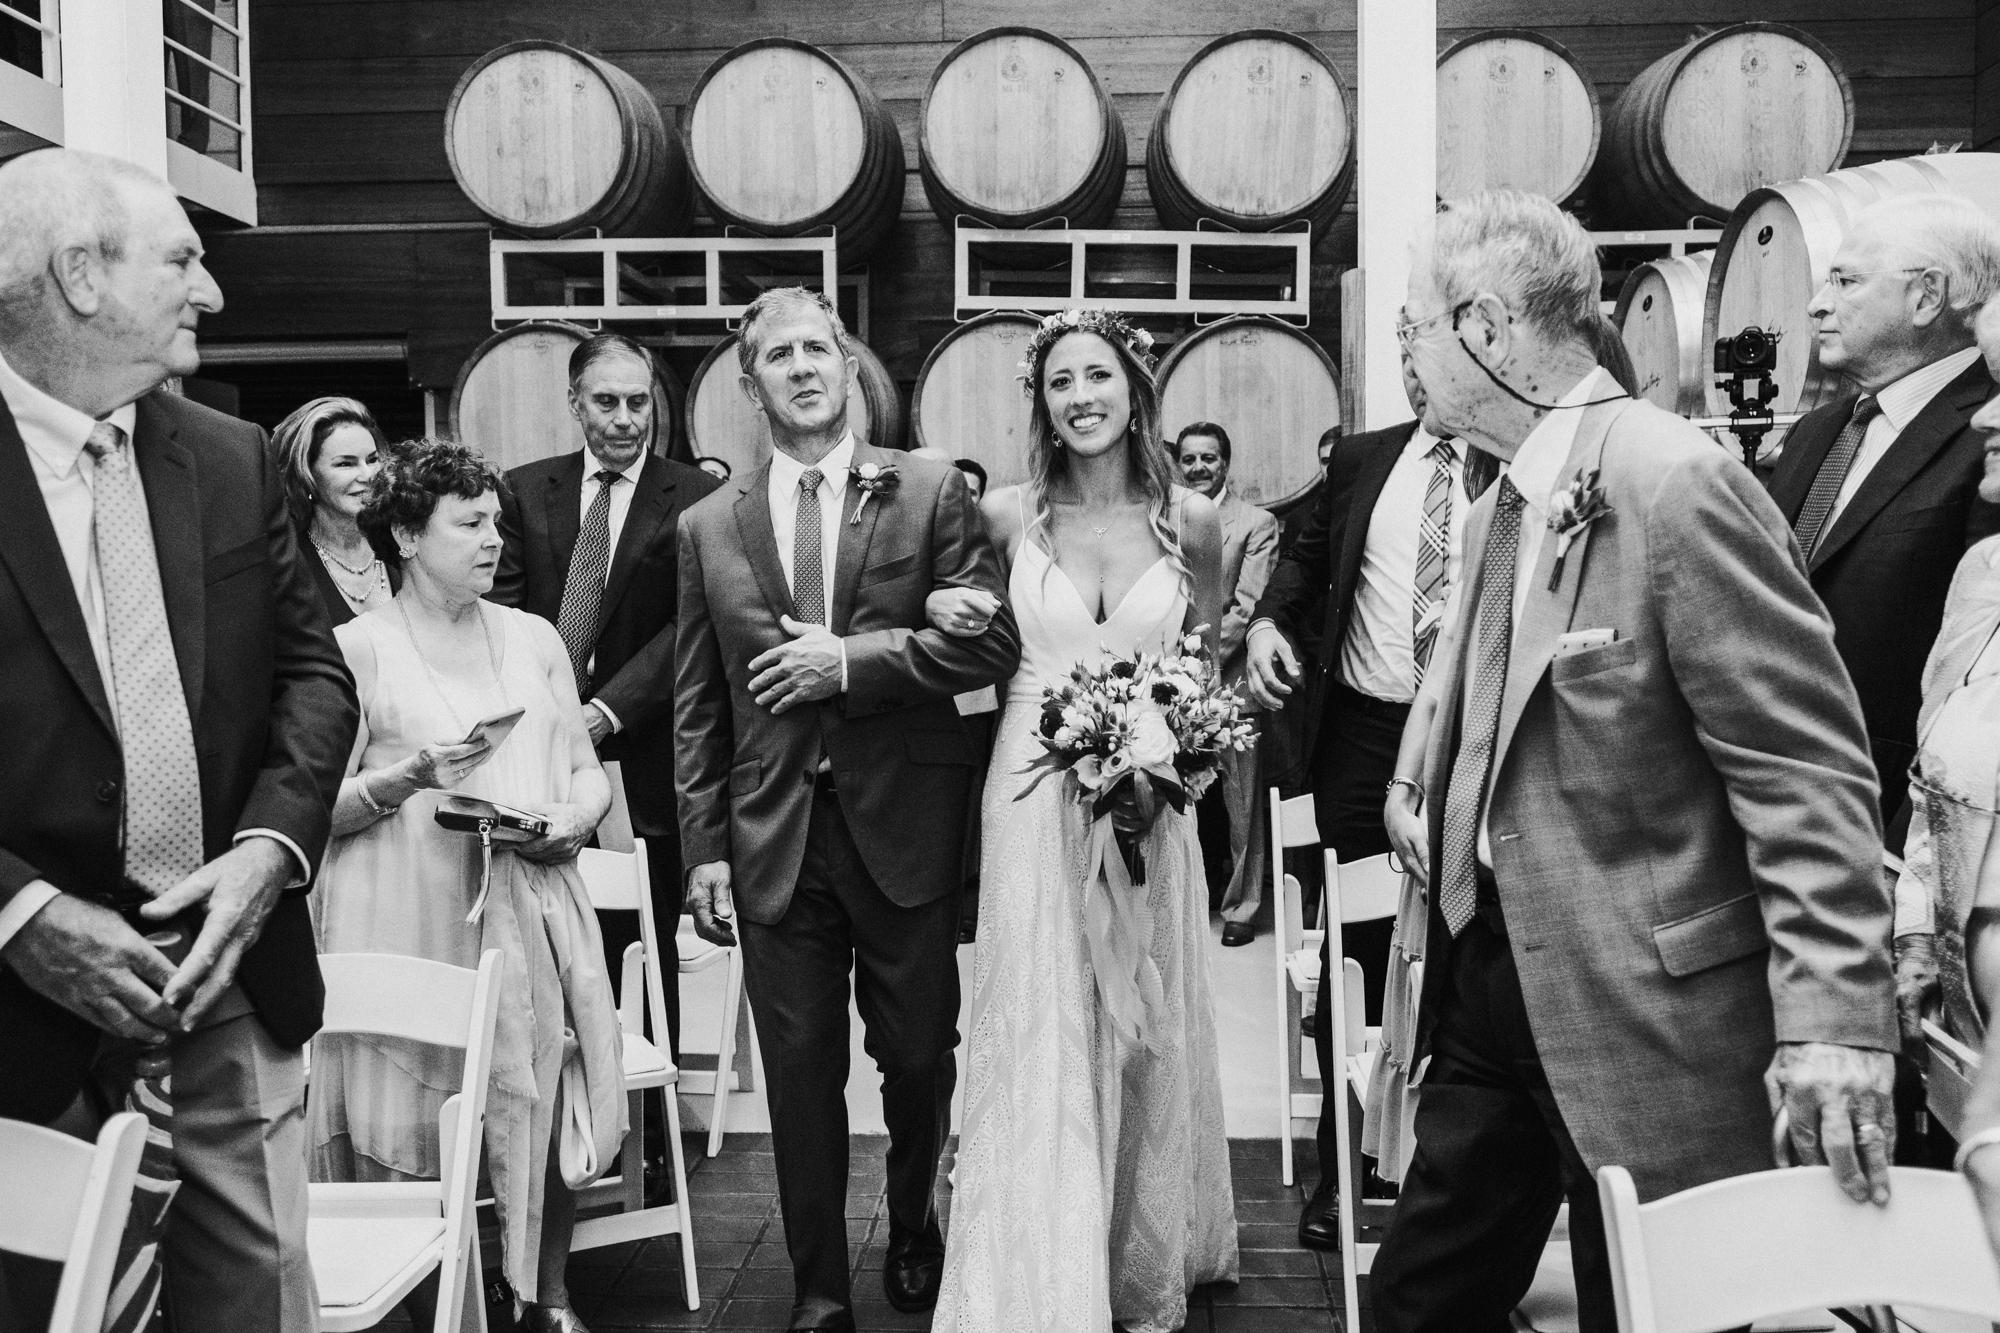 Wedding_Francis_Boucher_Jonathan_Edwards_Winery_2018-42.jpg